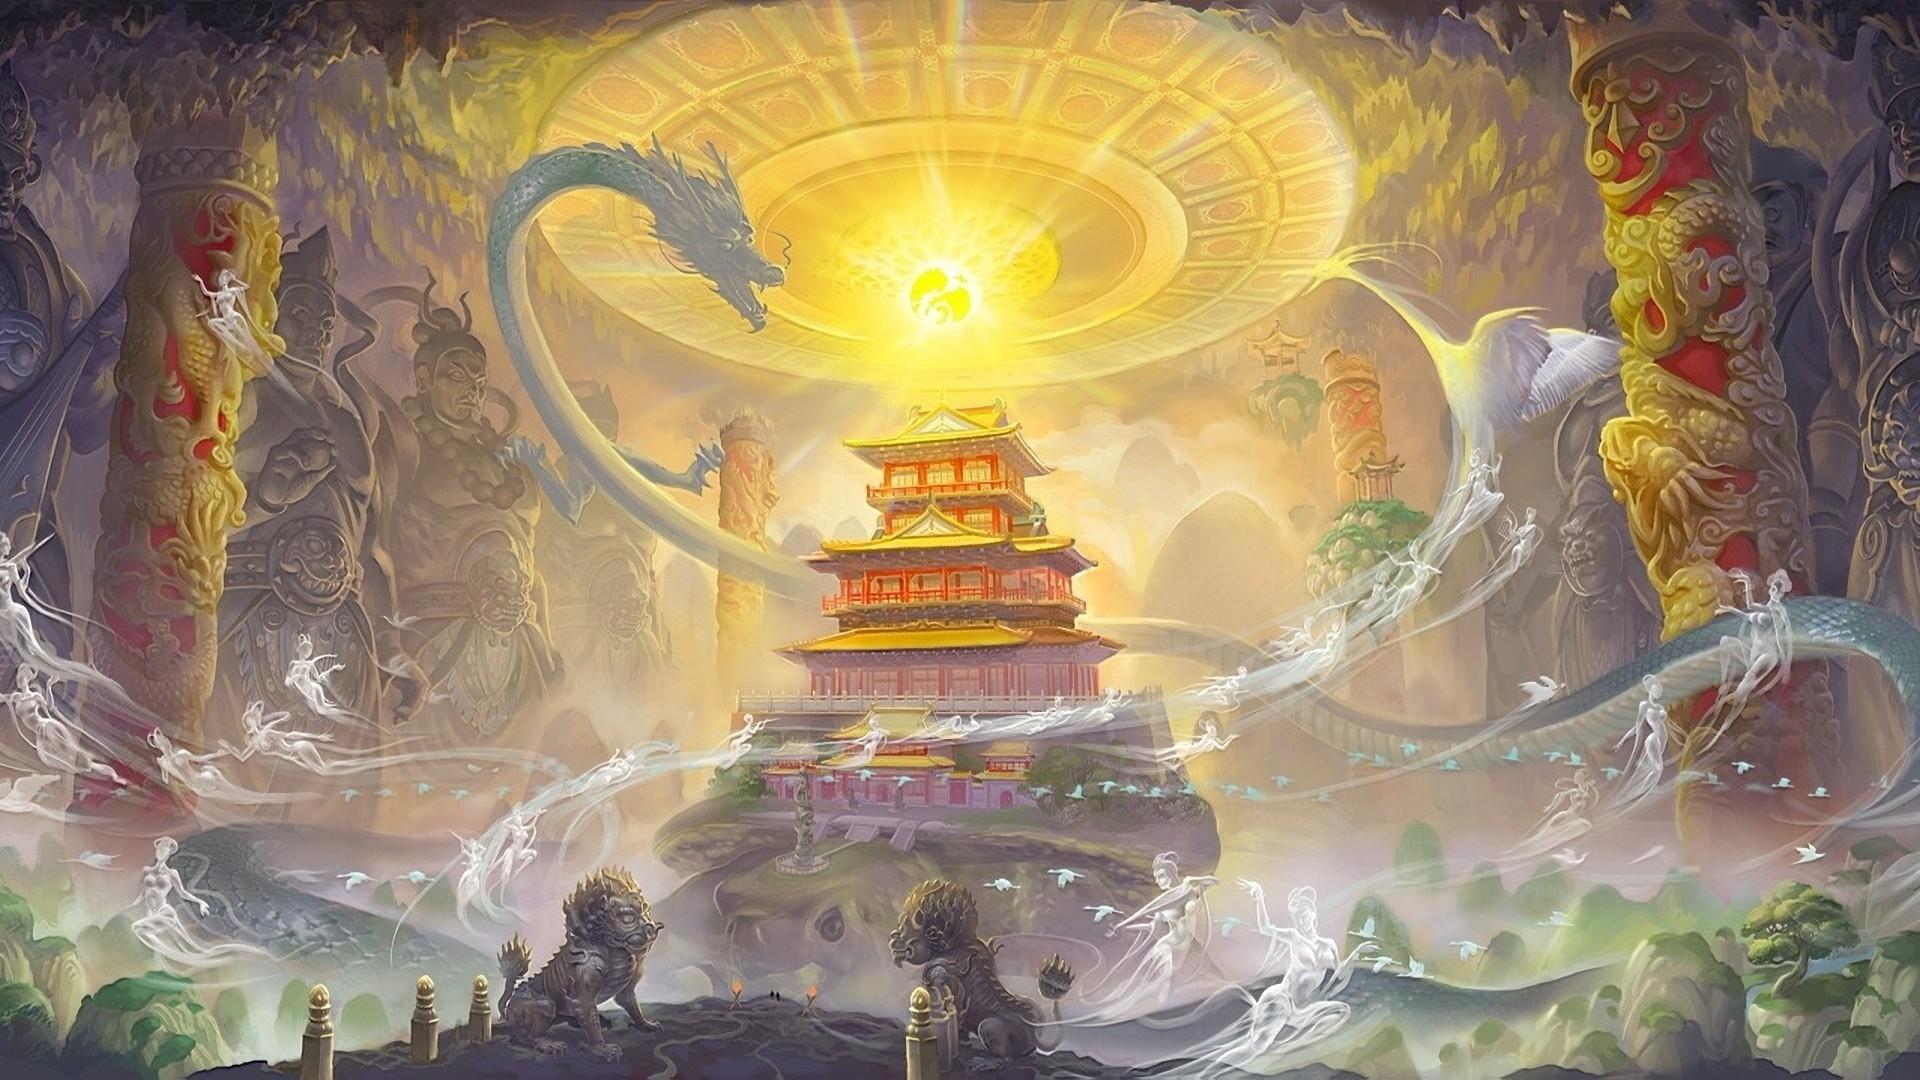 Fantasy dragon asian oriental art castle wallpaper